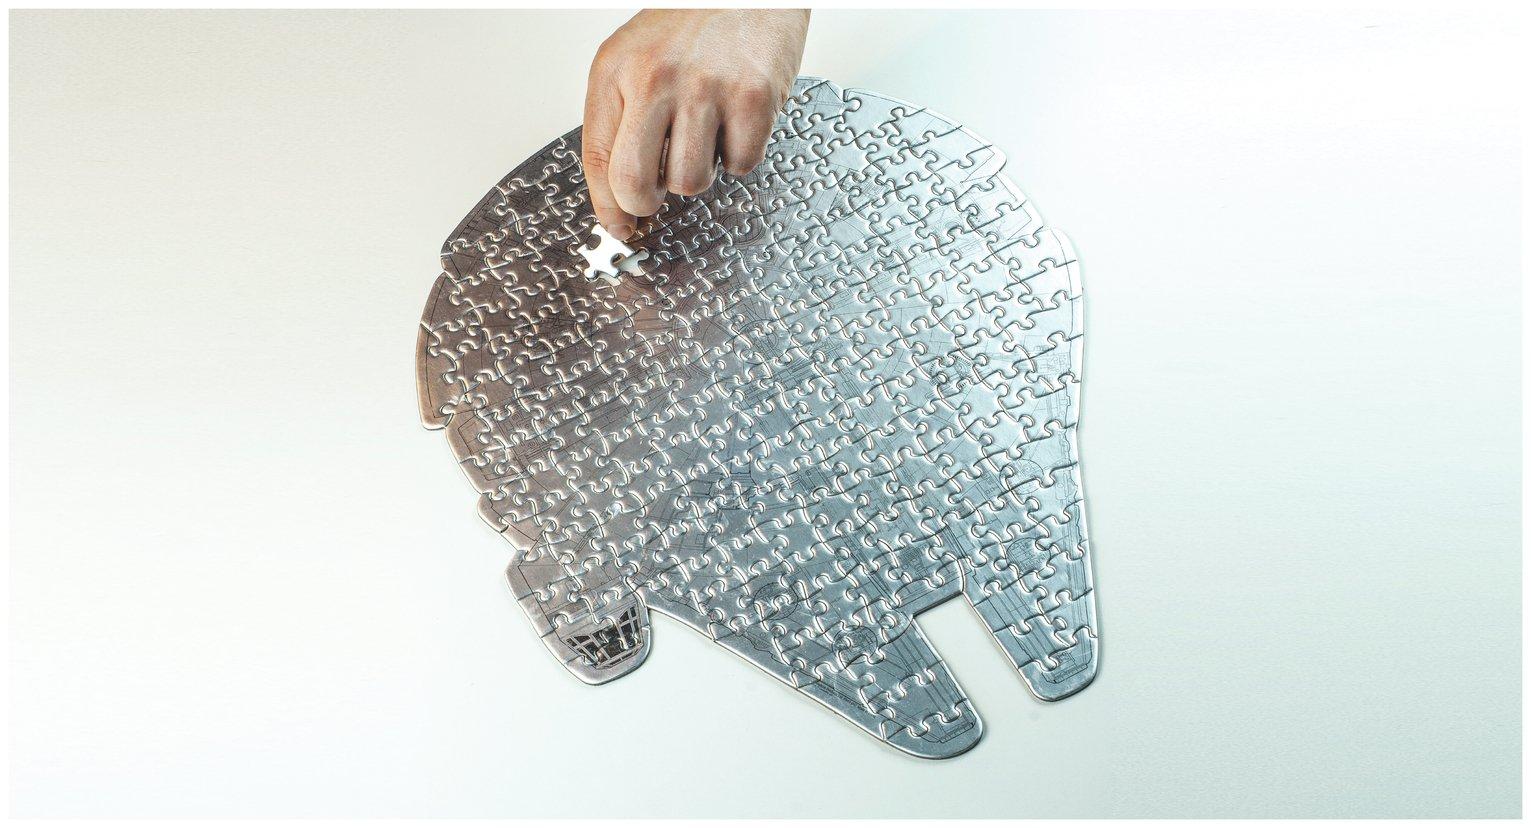 Star Wars Millenium Falcon 201 Piece Jigsaw and Tin